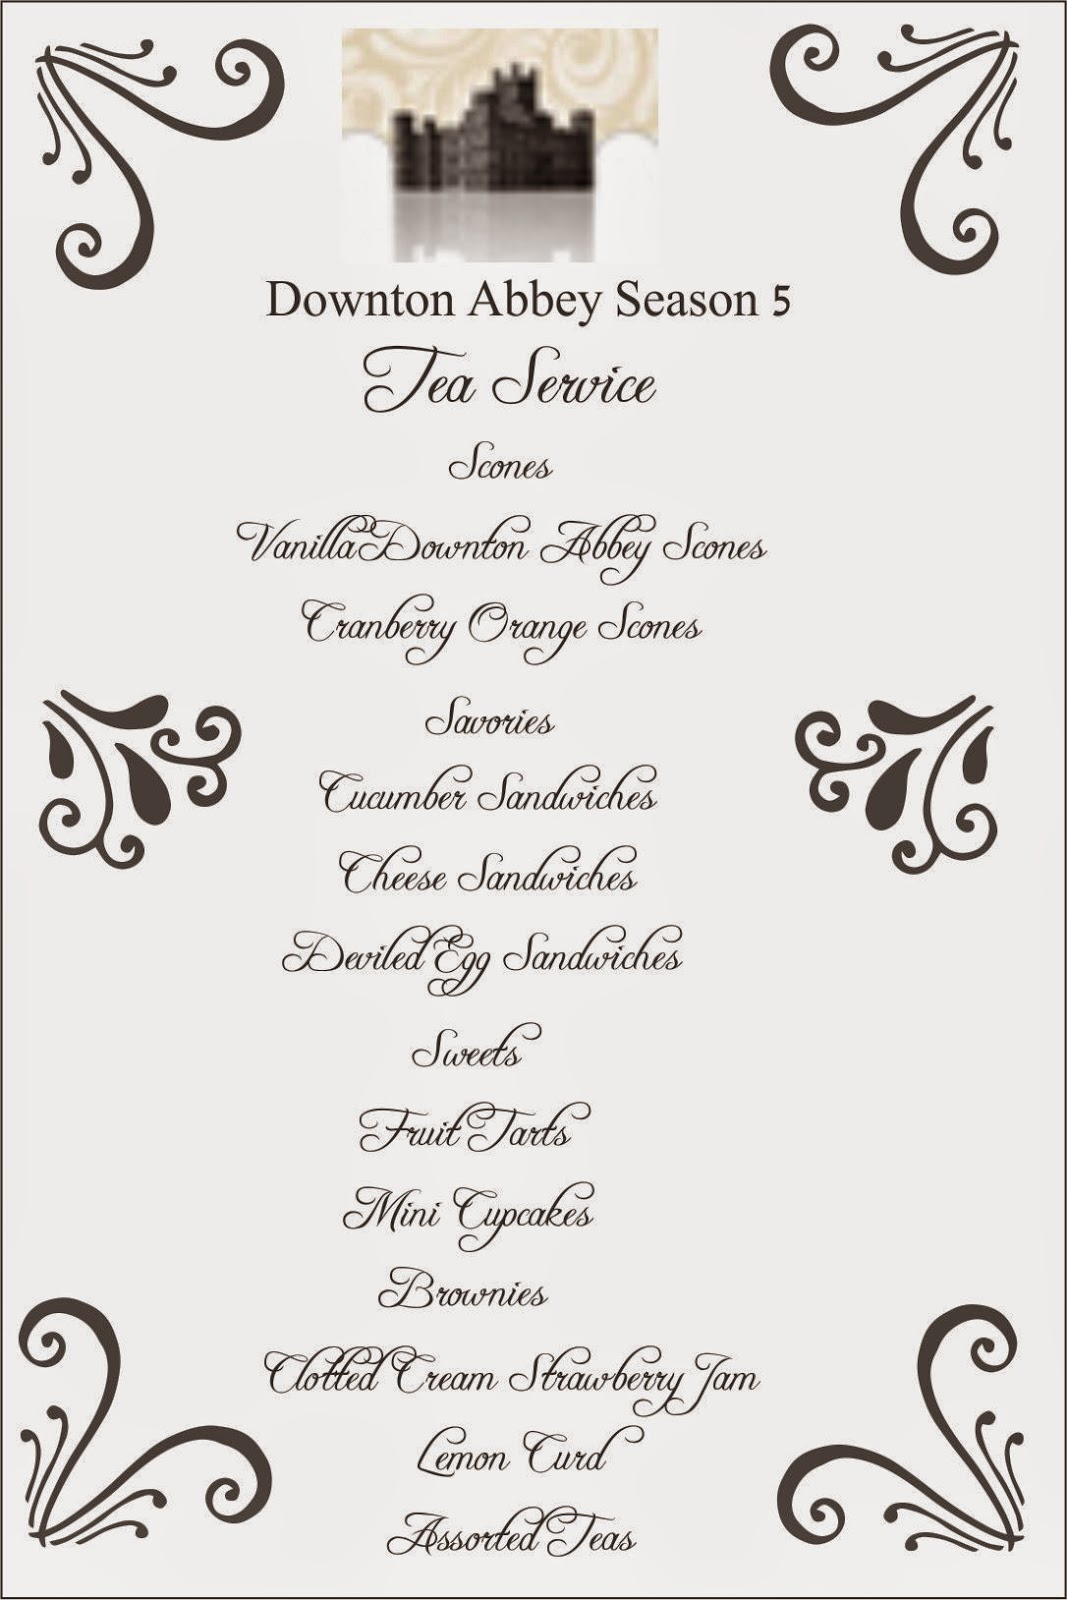 How D You Do That Downton Abbey Season 5 Party